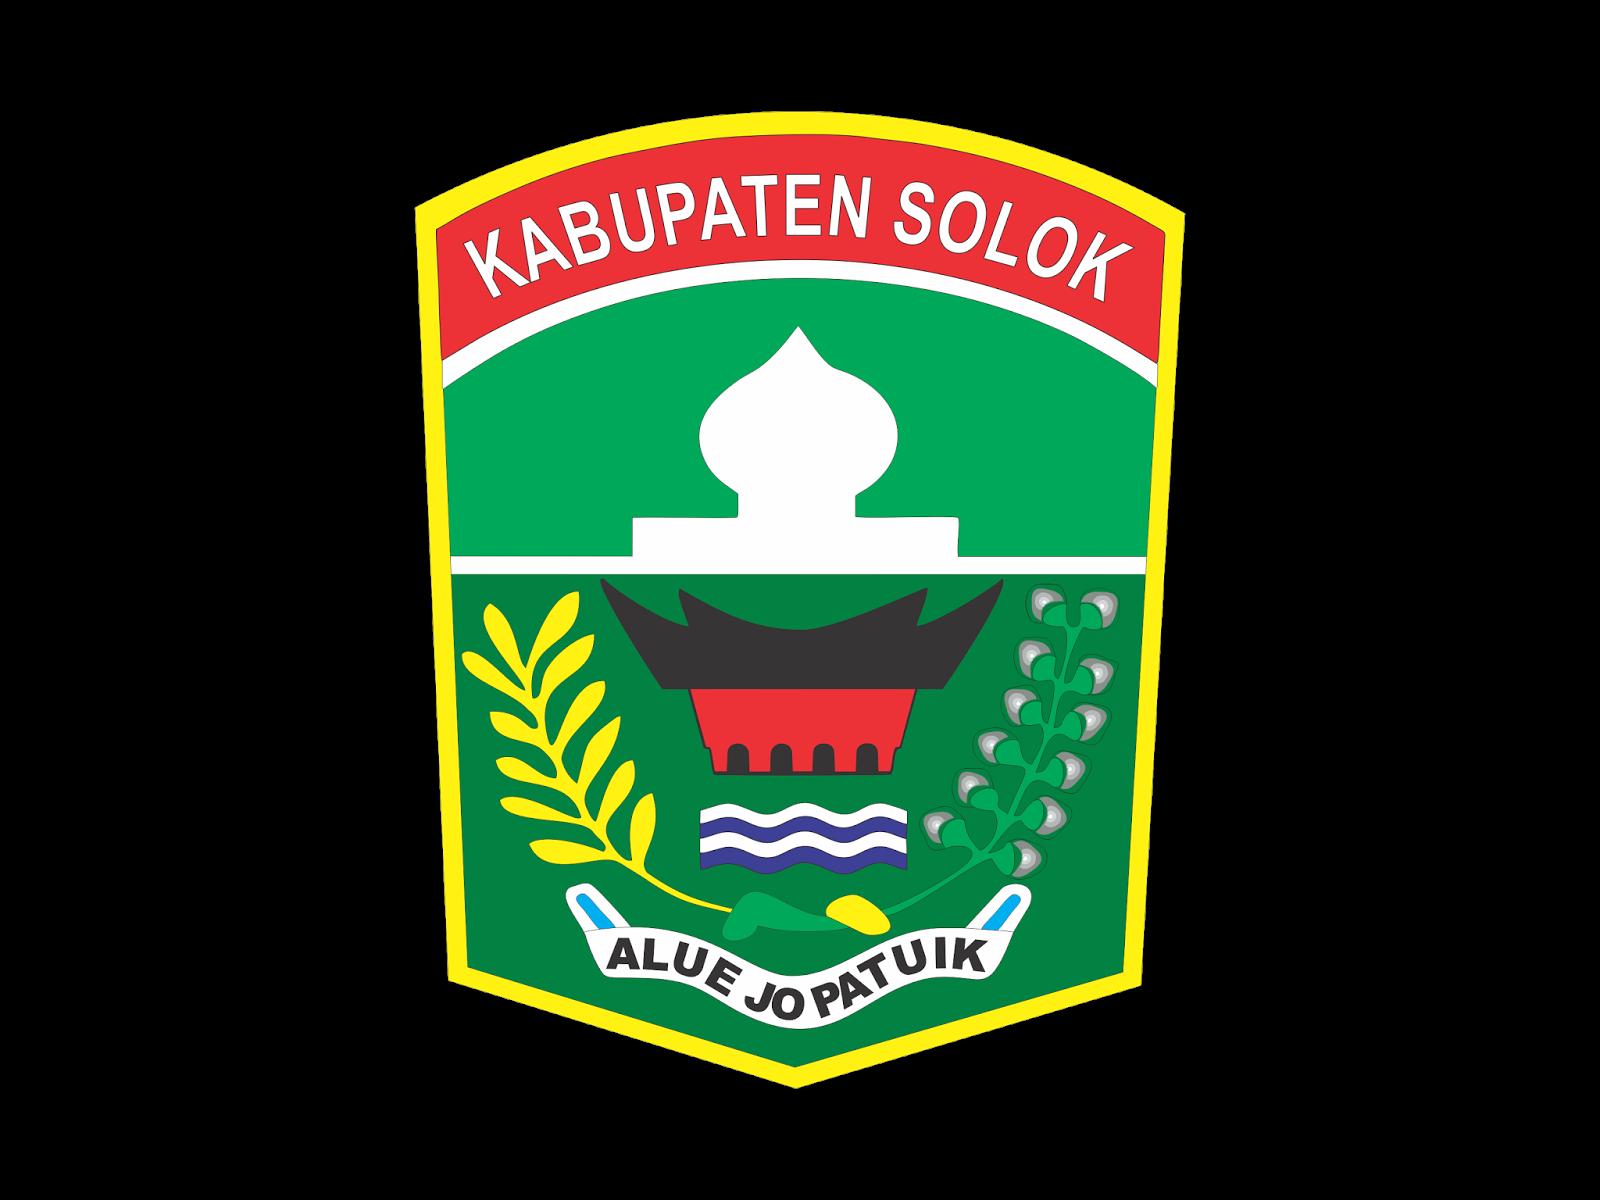 Logo Kabupaten Solok Vector Cdr Png Hd Biologizone